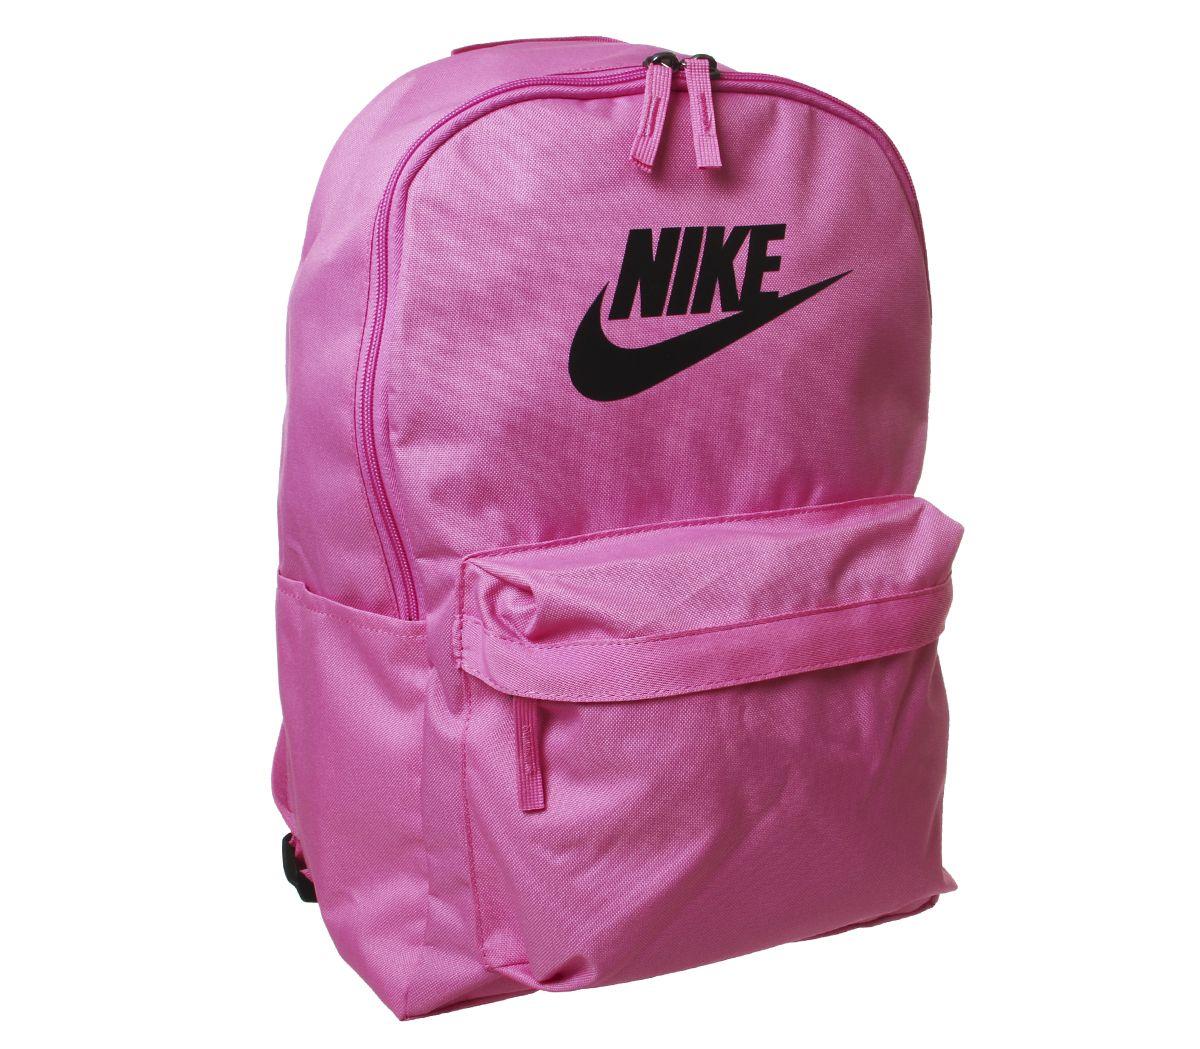 c2dfa7ca0 Nike Nike Heritage Backpack 2.0 China Rose Black - Accessories